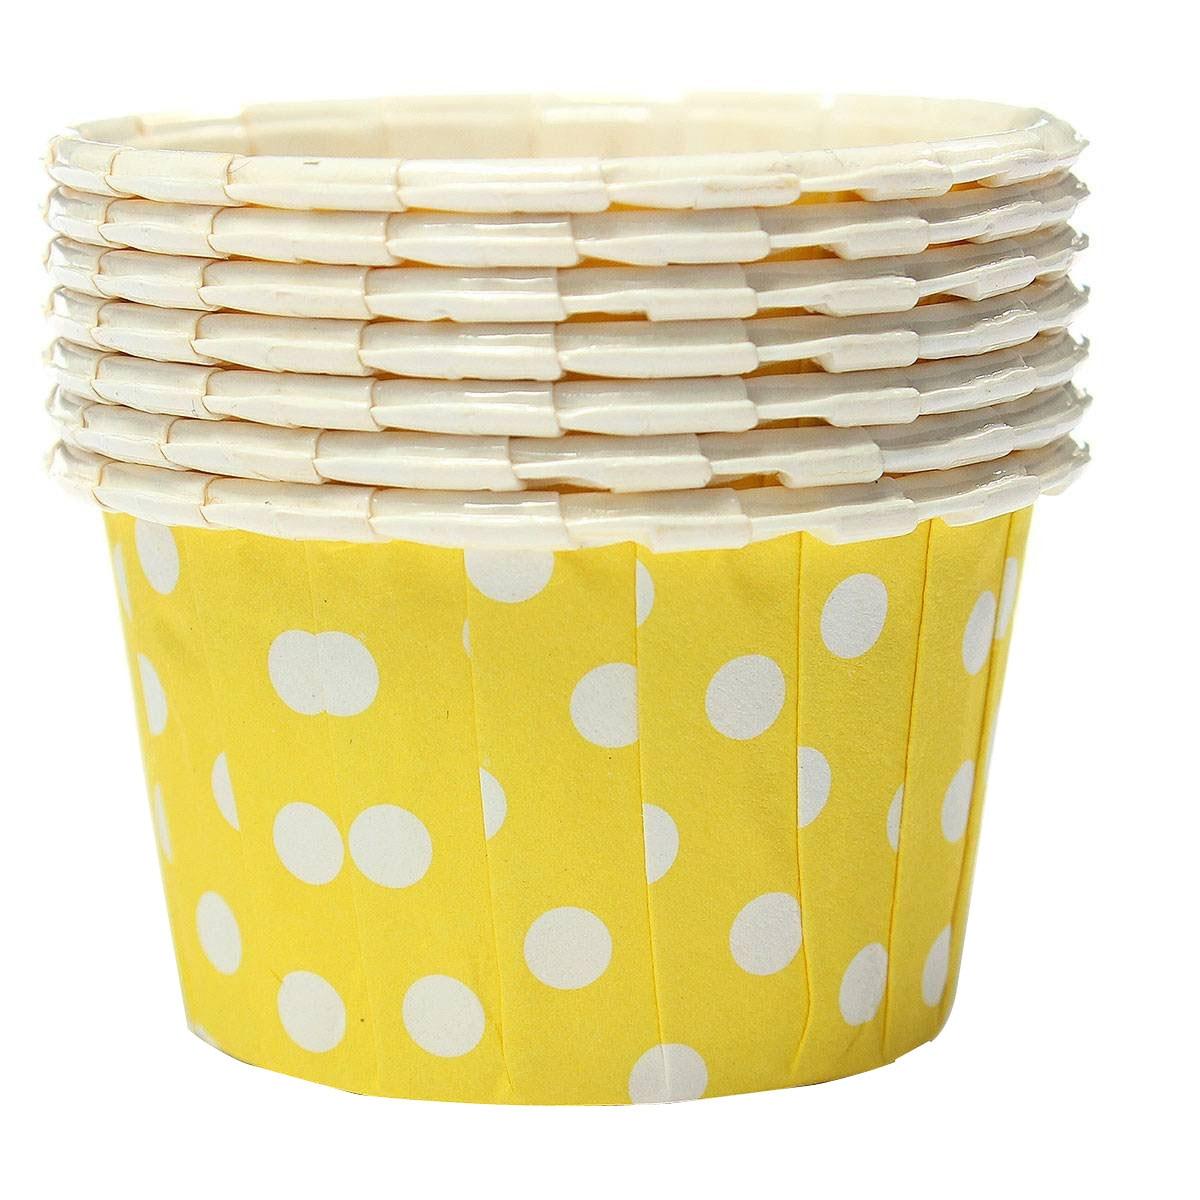 FJS!100X Cupcake per Paper Cake Case Baking Cups Liner Muffin Yellow